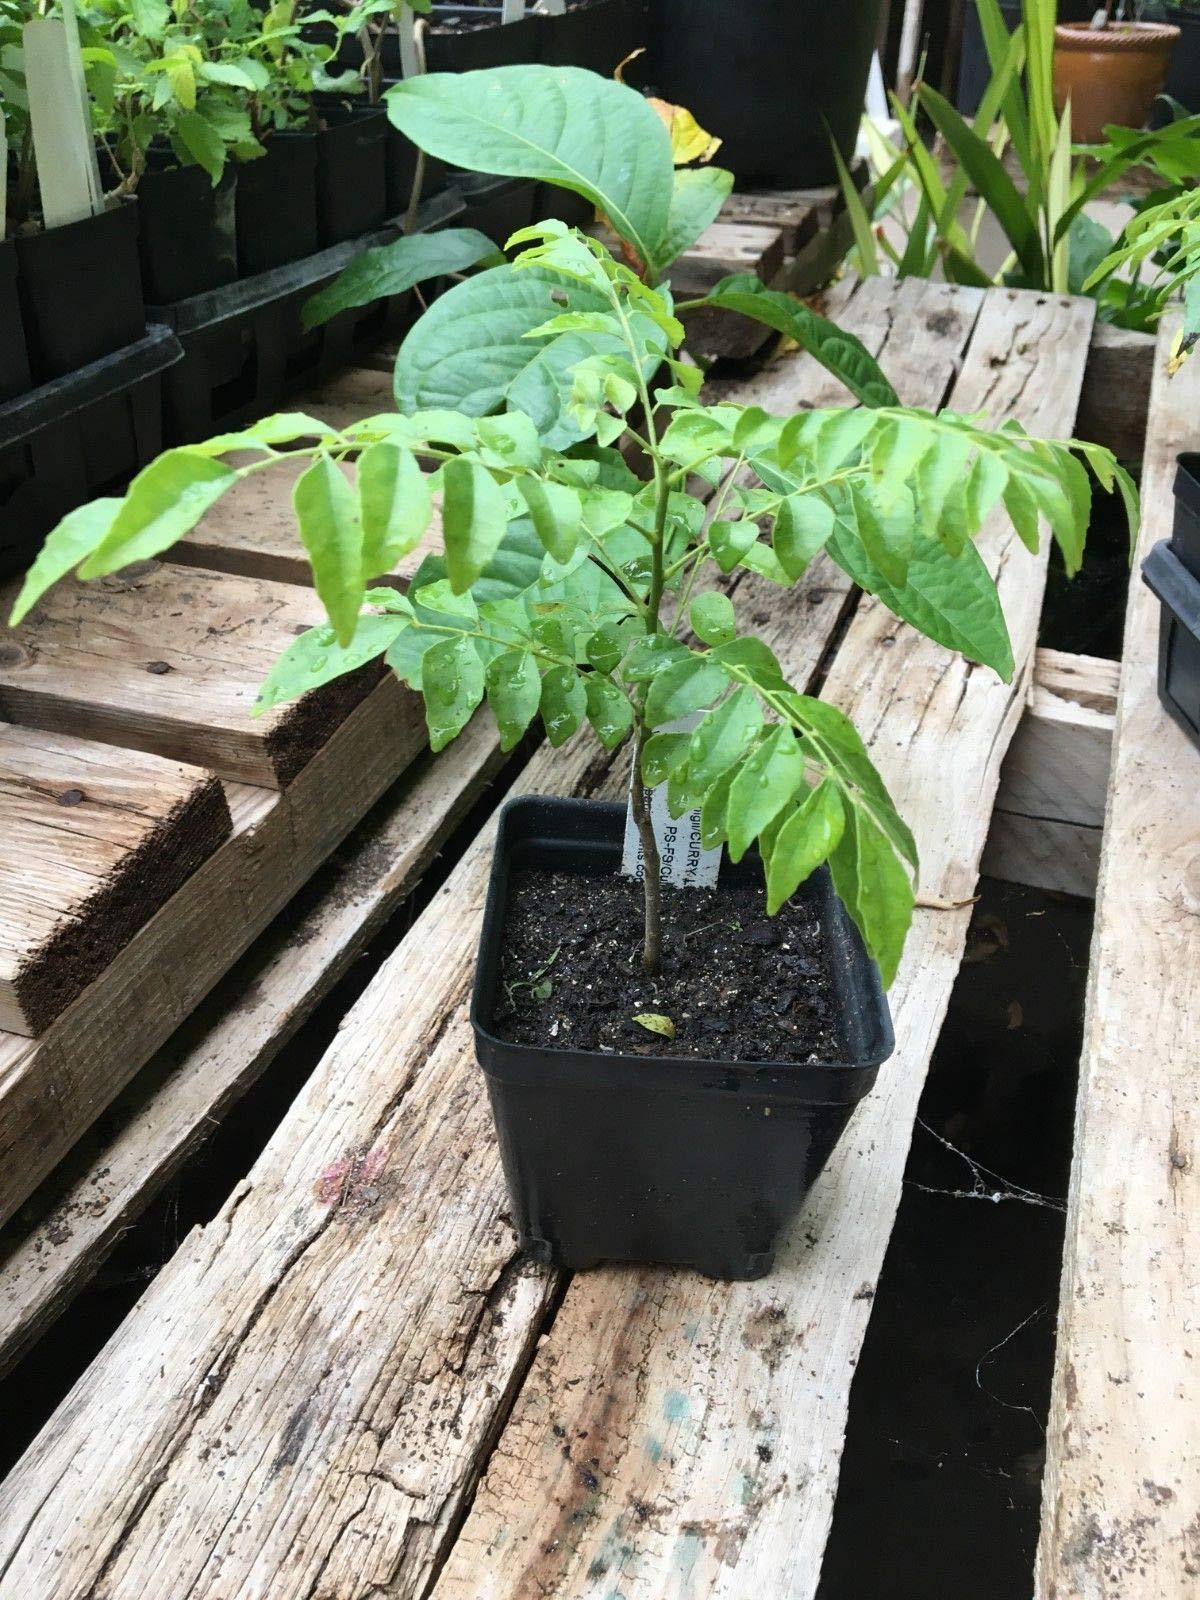 Curry Leaf Tree Murraya koenigii Live Plant Tropical Tree in a 4 inch Pot